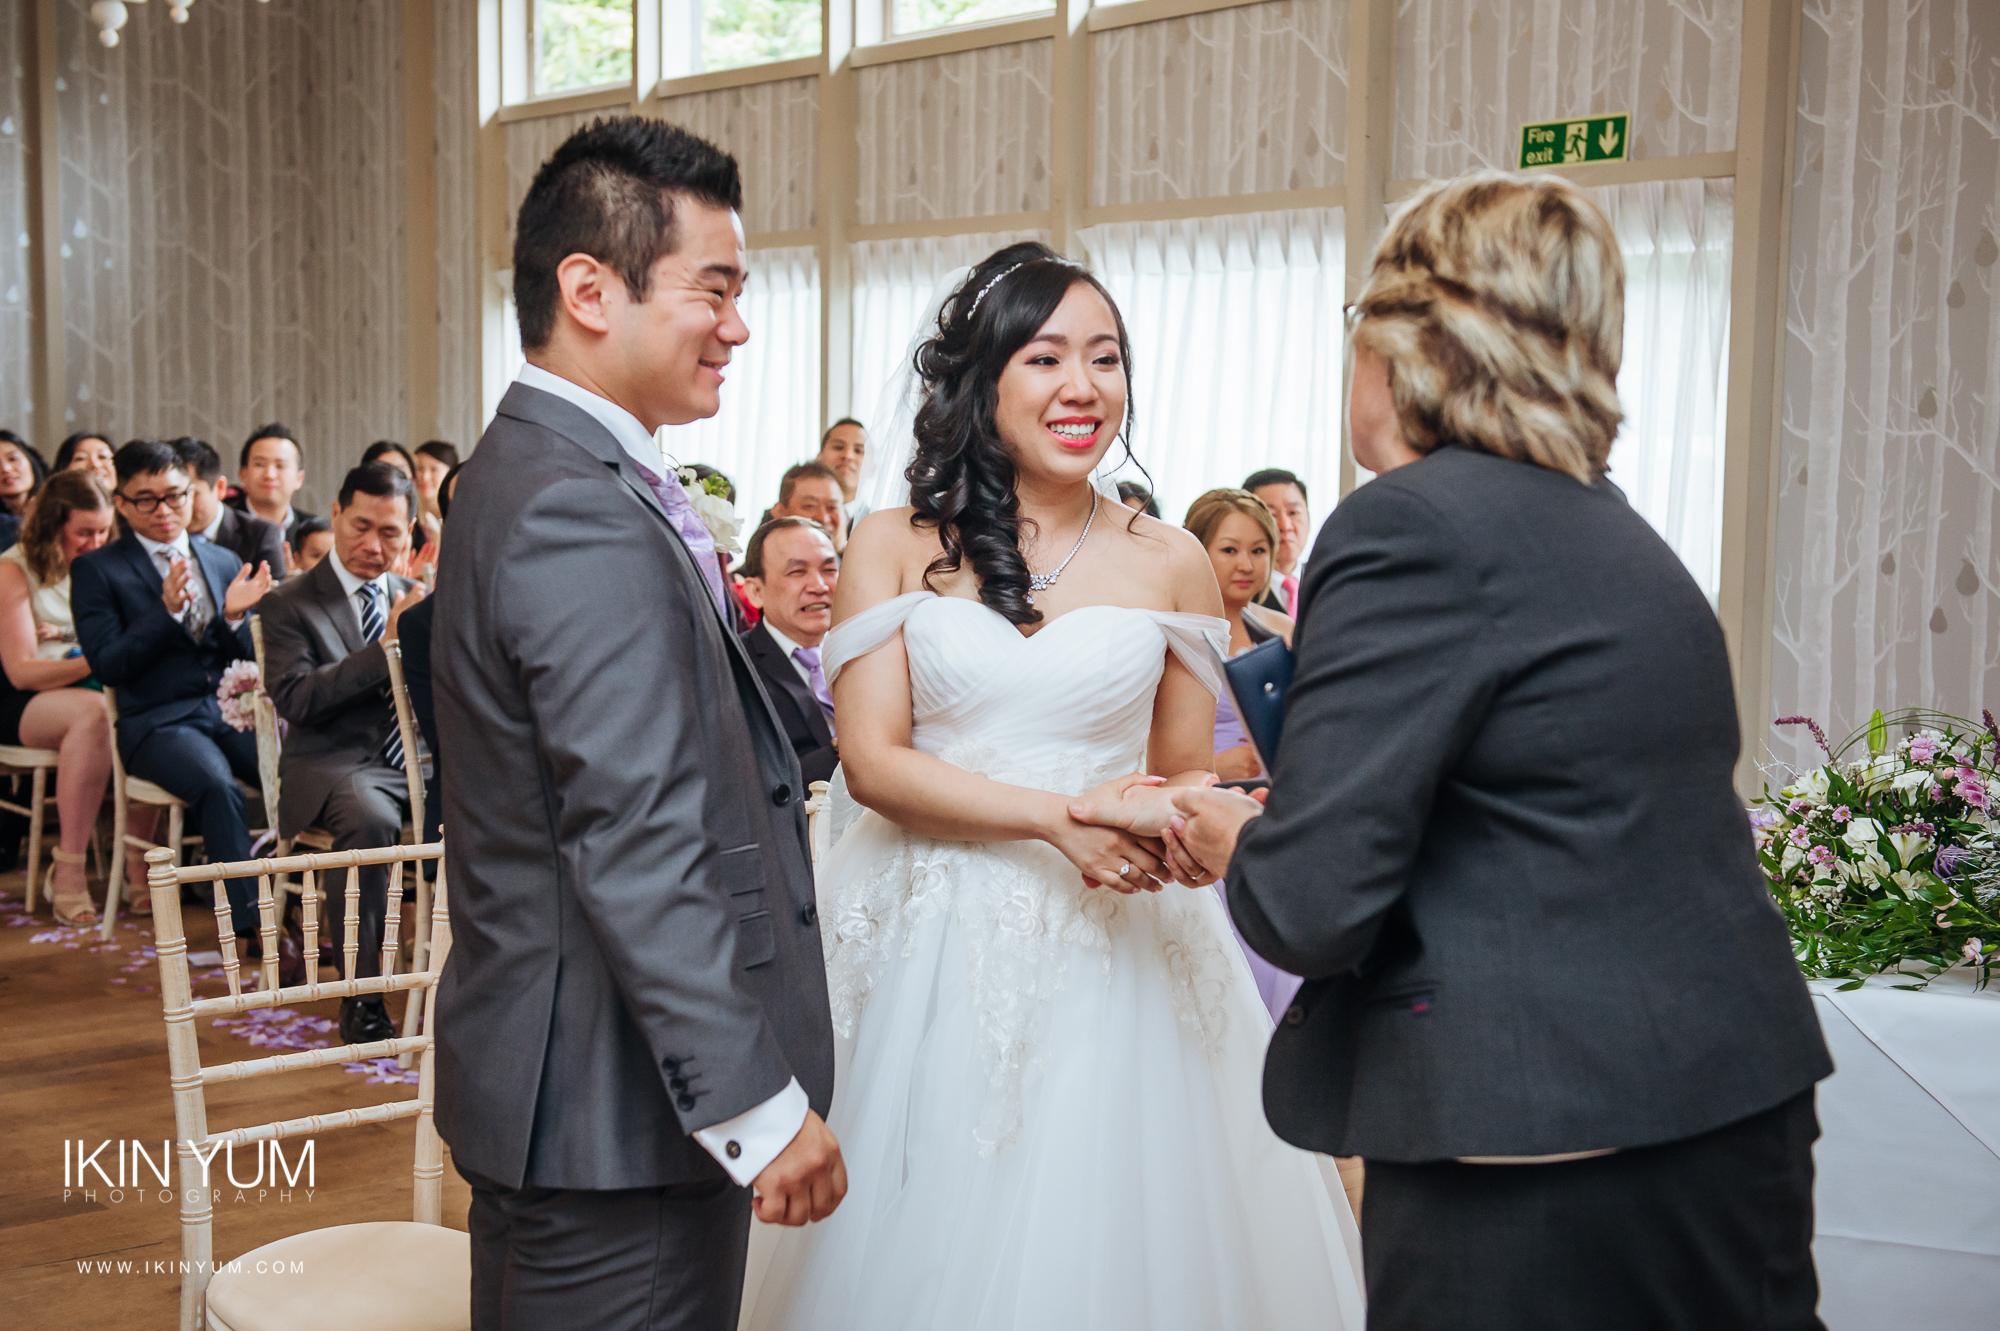 Hampton Manor Wedding - Ikin Yum Photography -085.jpg